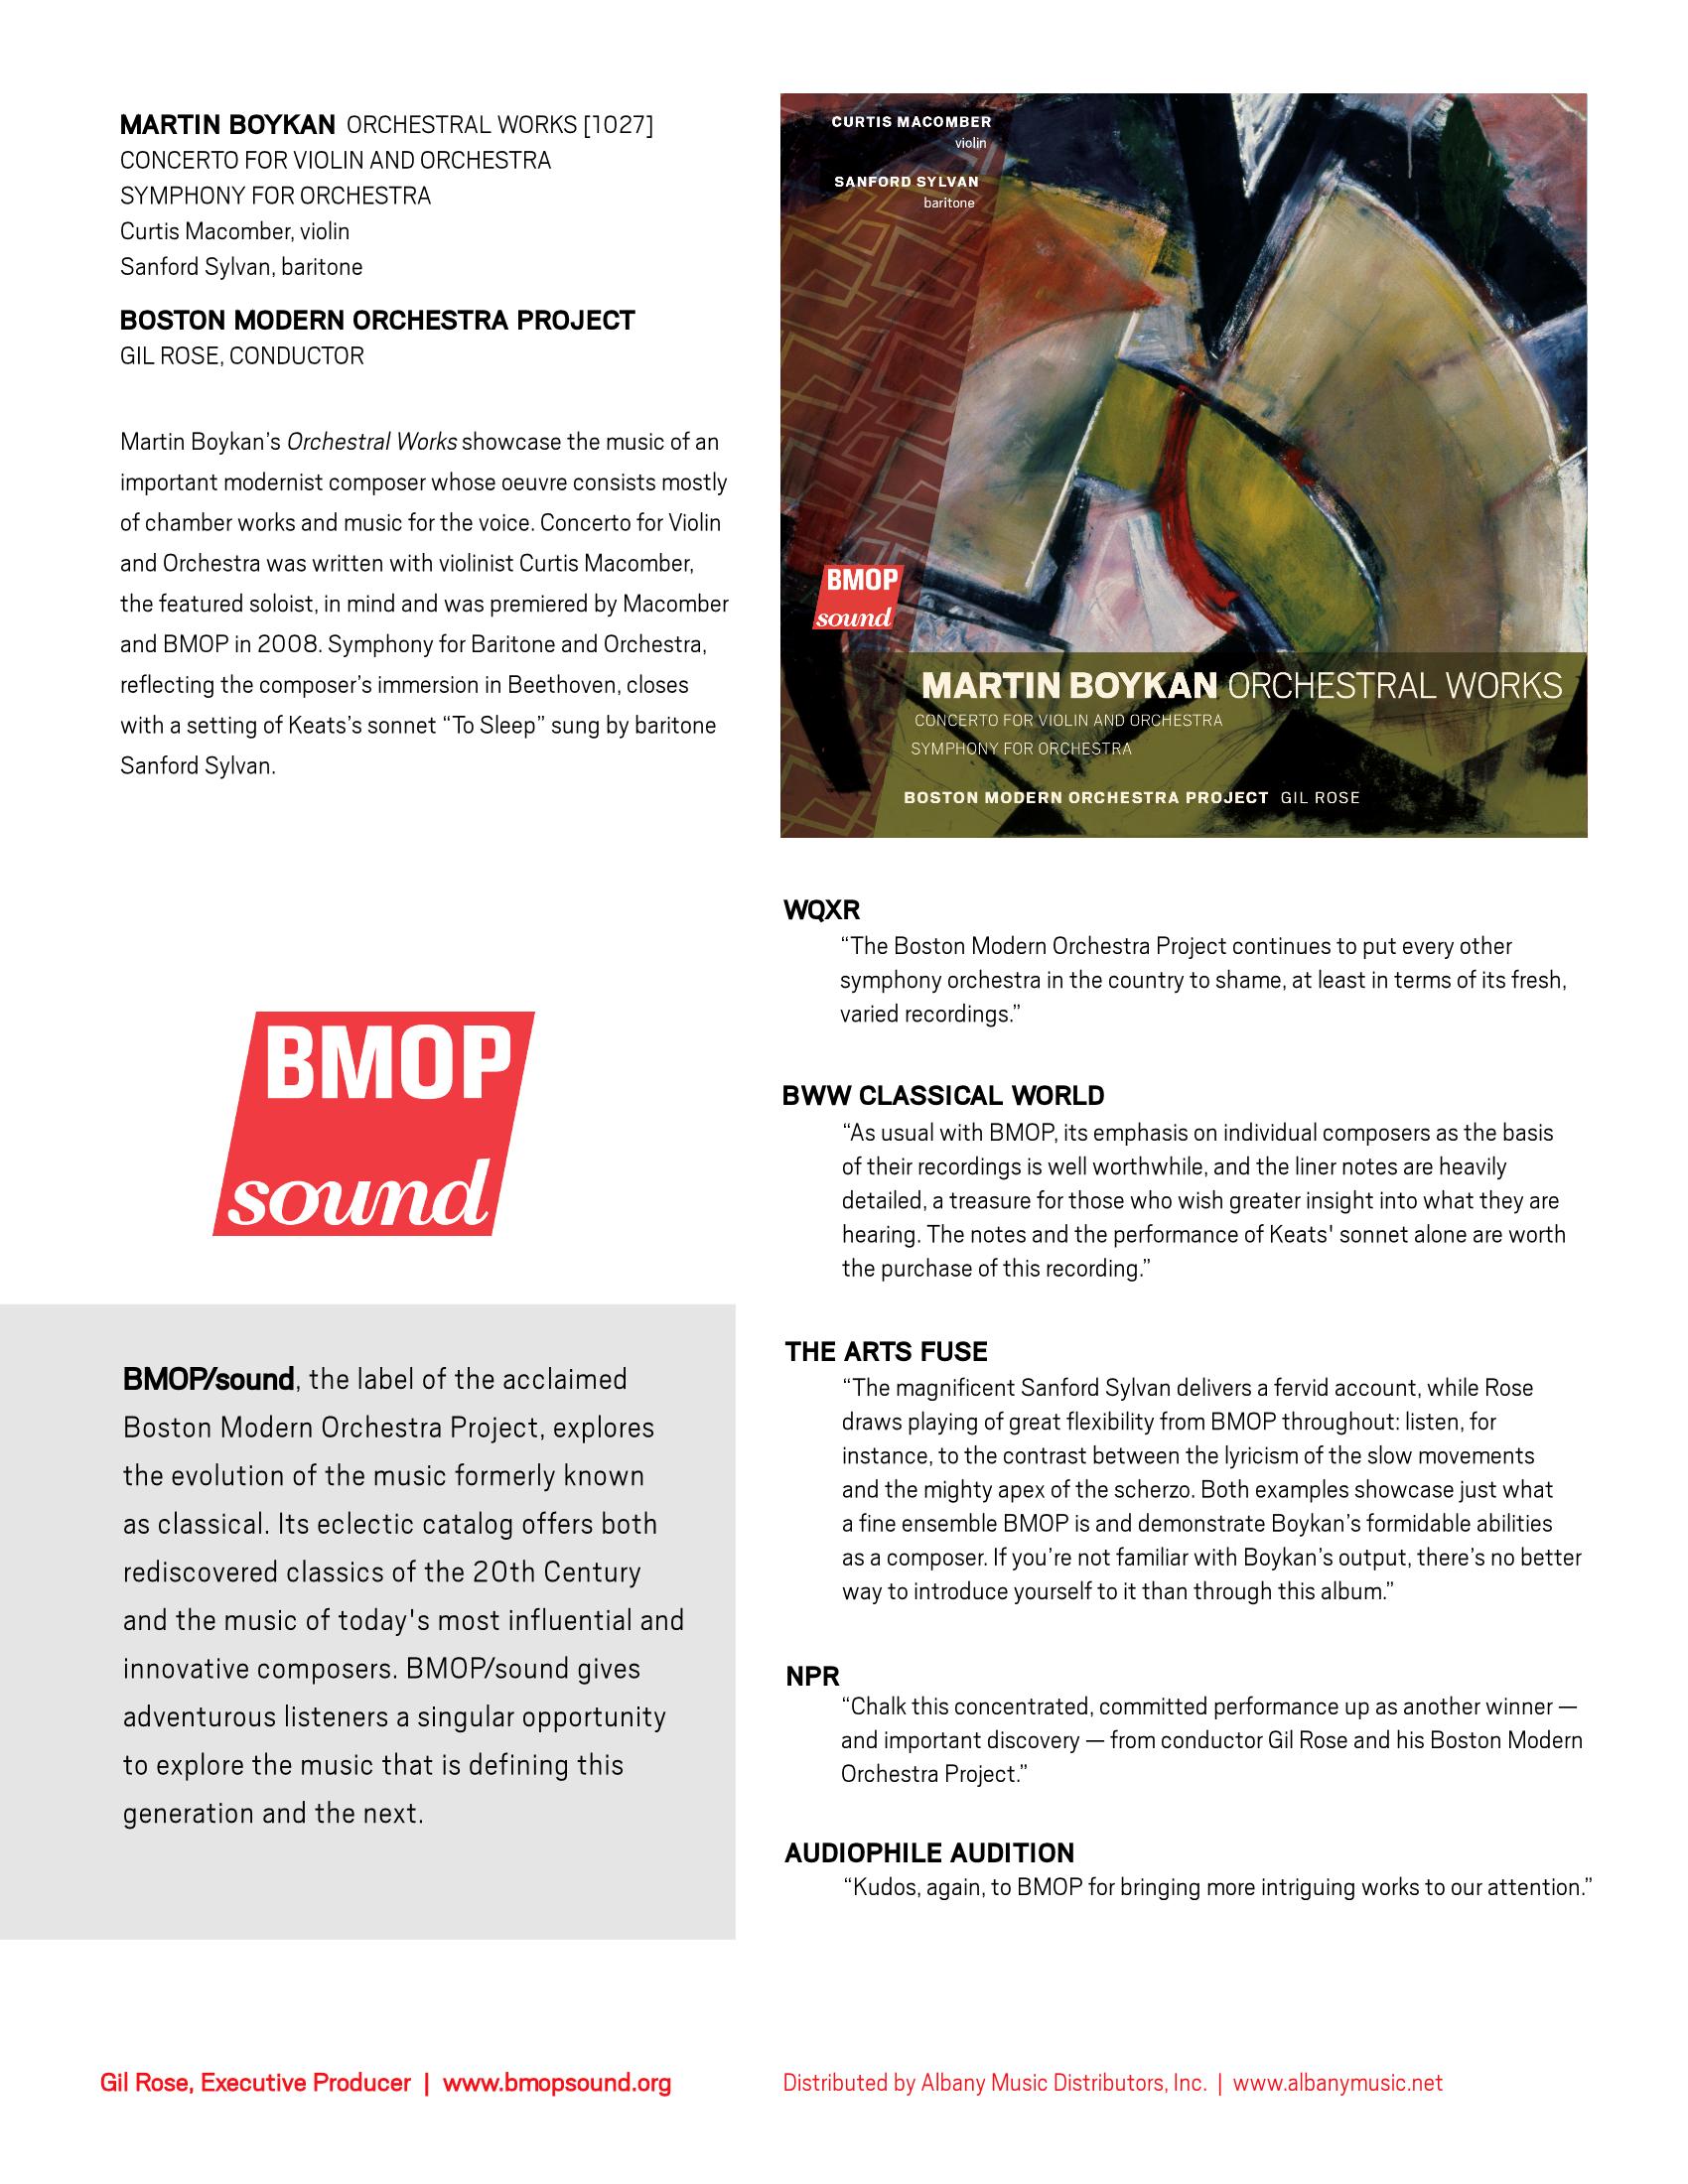 Boykan - BMOPsound 1027 one-sheet.png